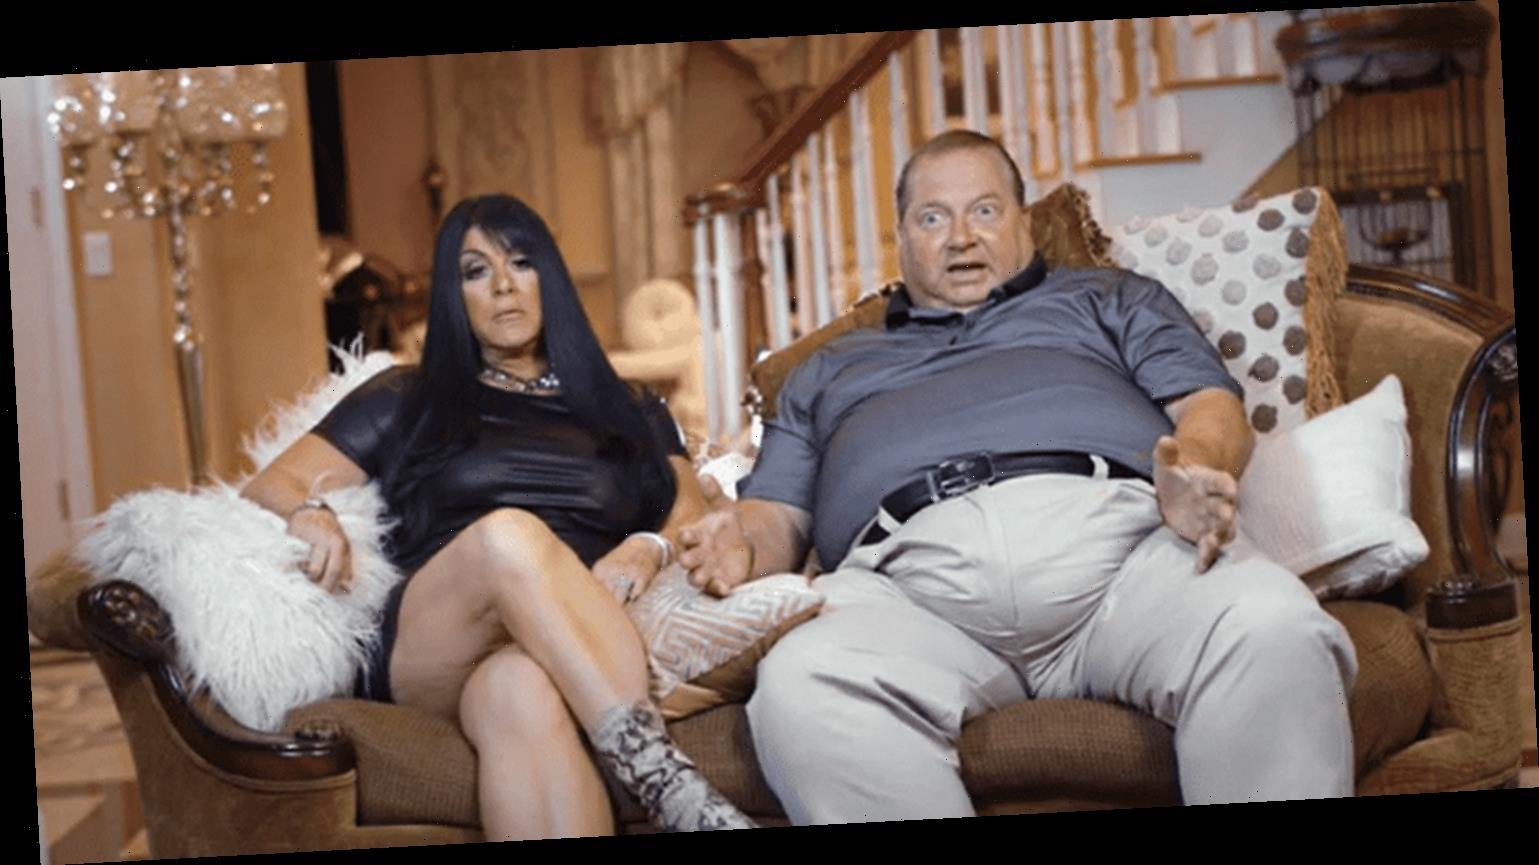 Unpolished's Jennifer Martone Reflects on Husband Big Mike's Death: 'He Suffered'